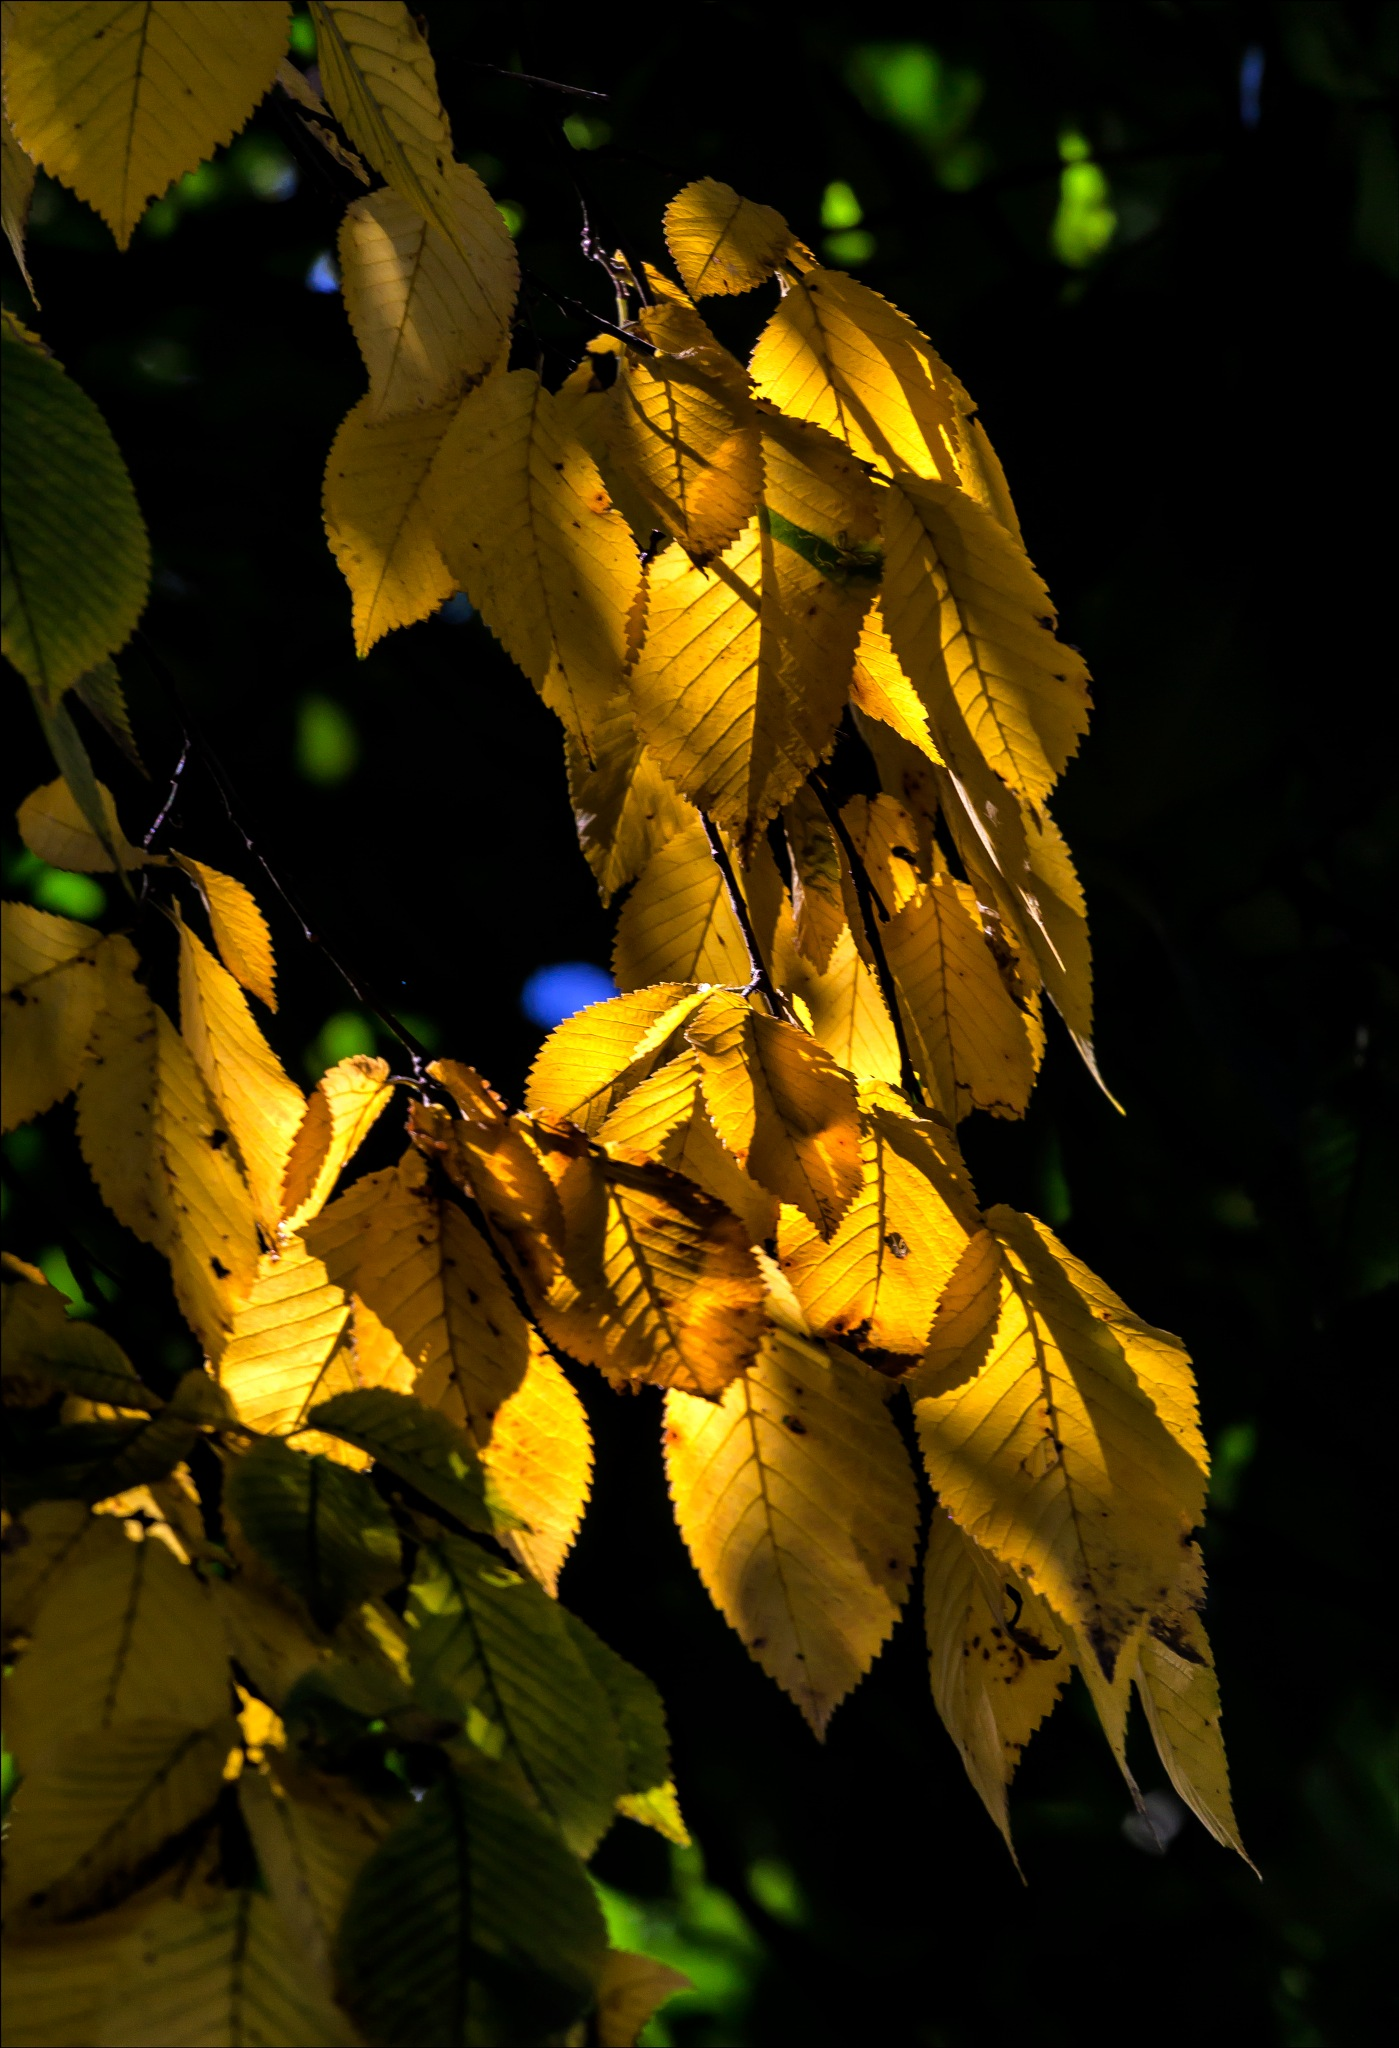 Autumn Leaves by robertullmann